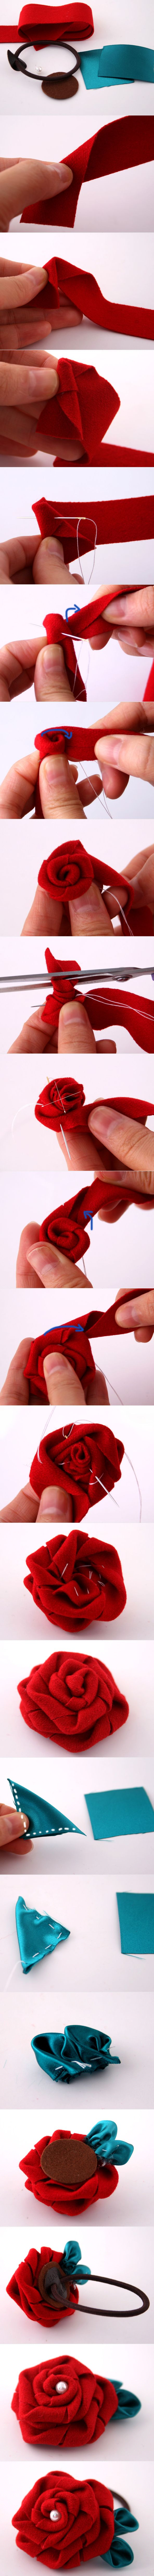 Full tutorial DIY handmade hair accessories hair ornaments homemade DIY do it yourself hair decorations - Taobao